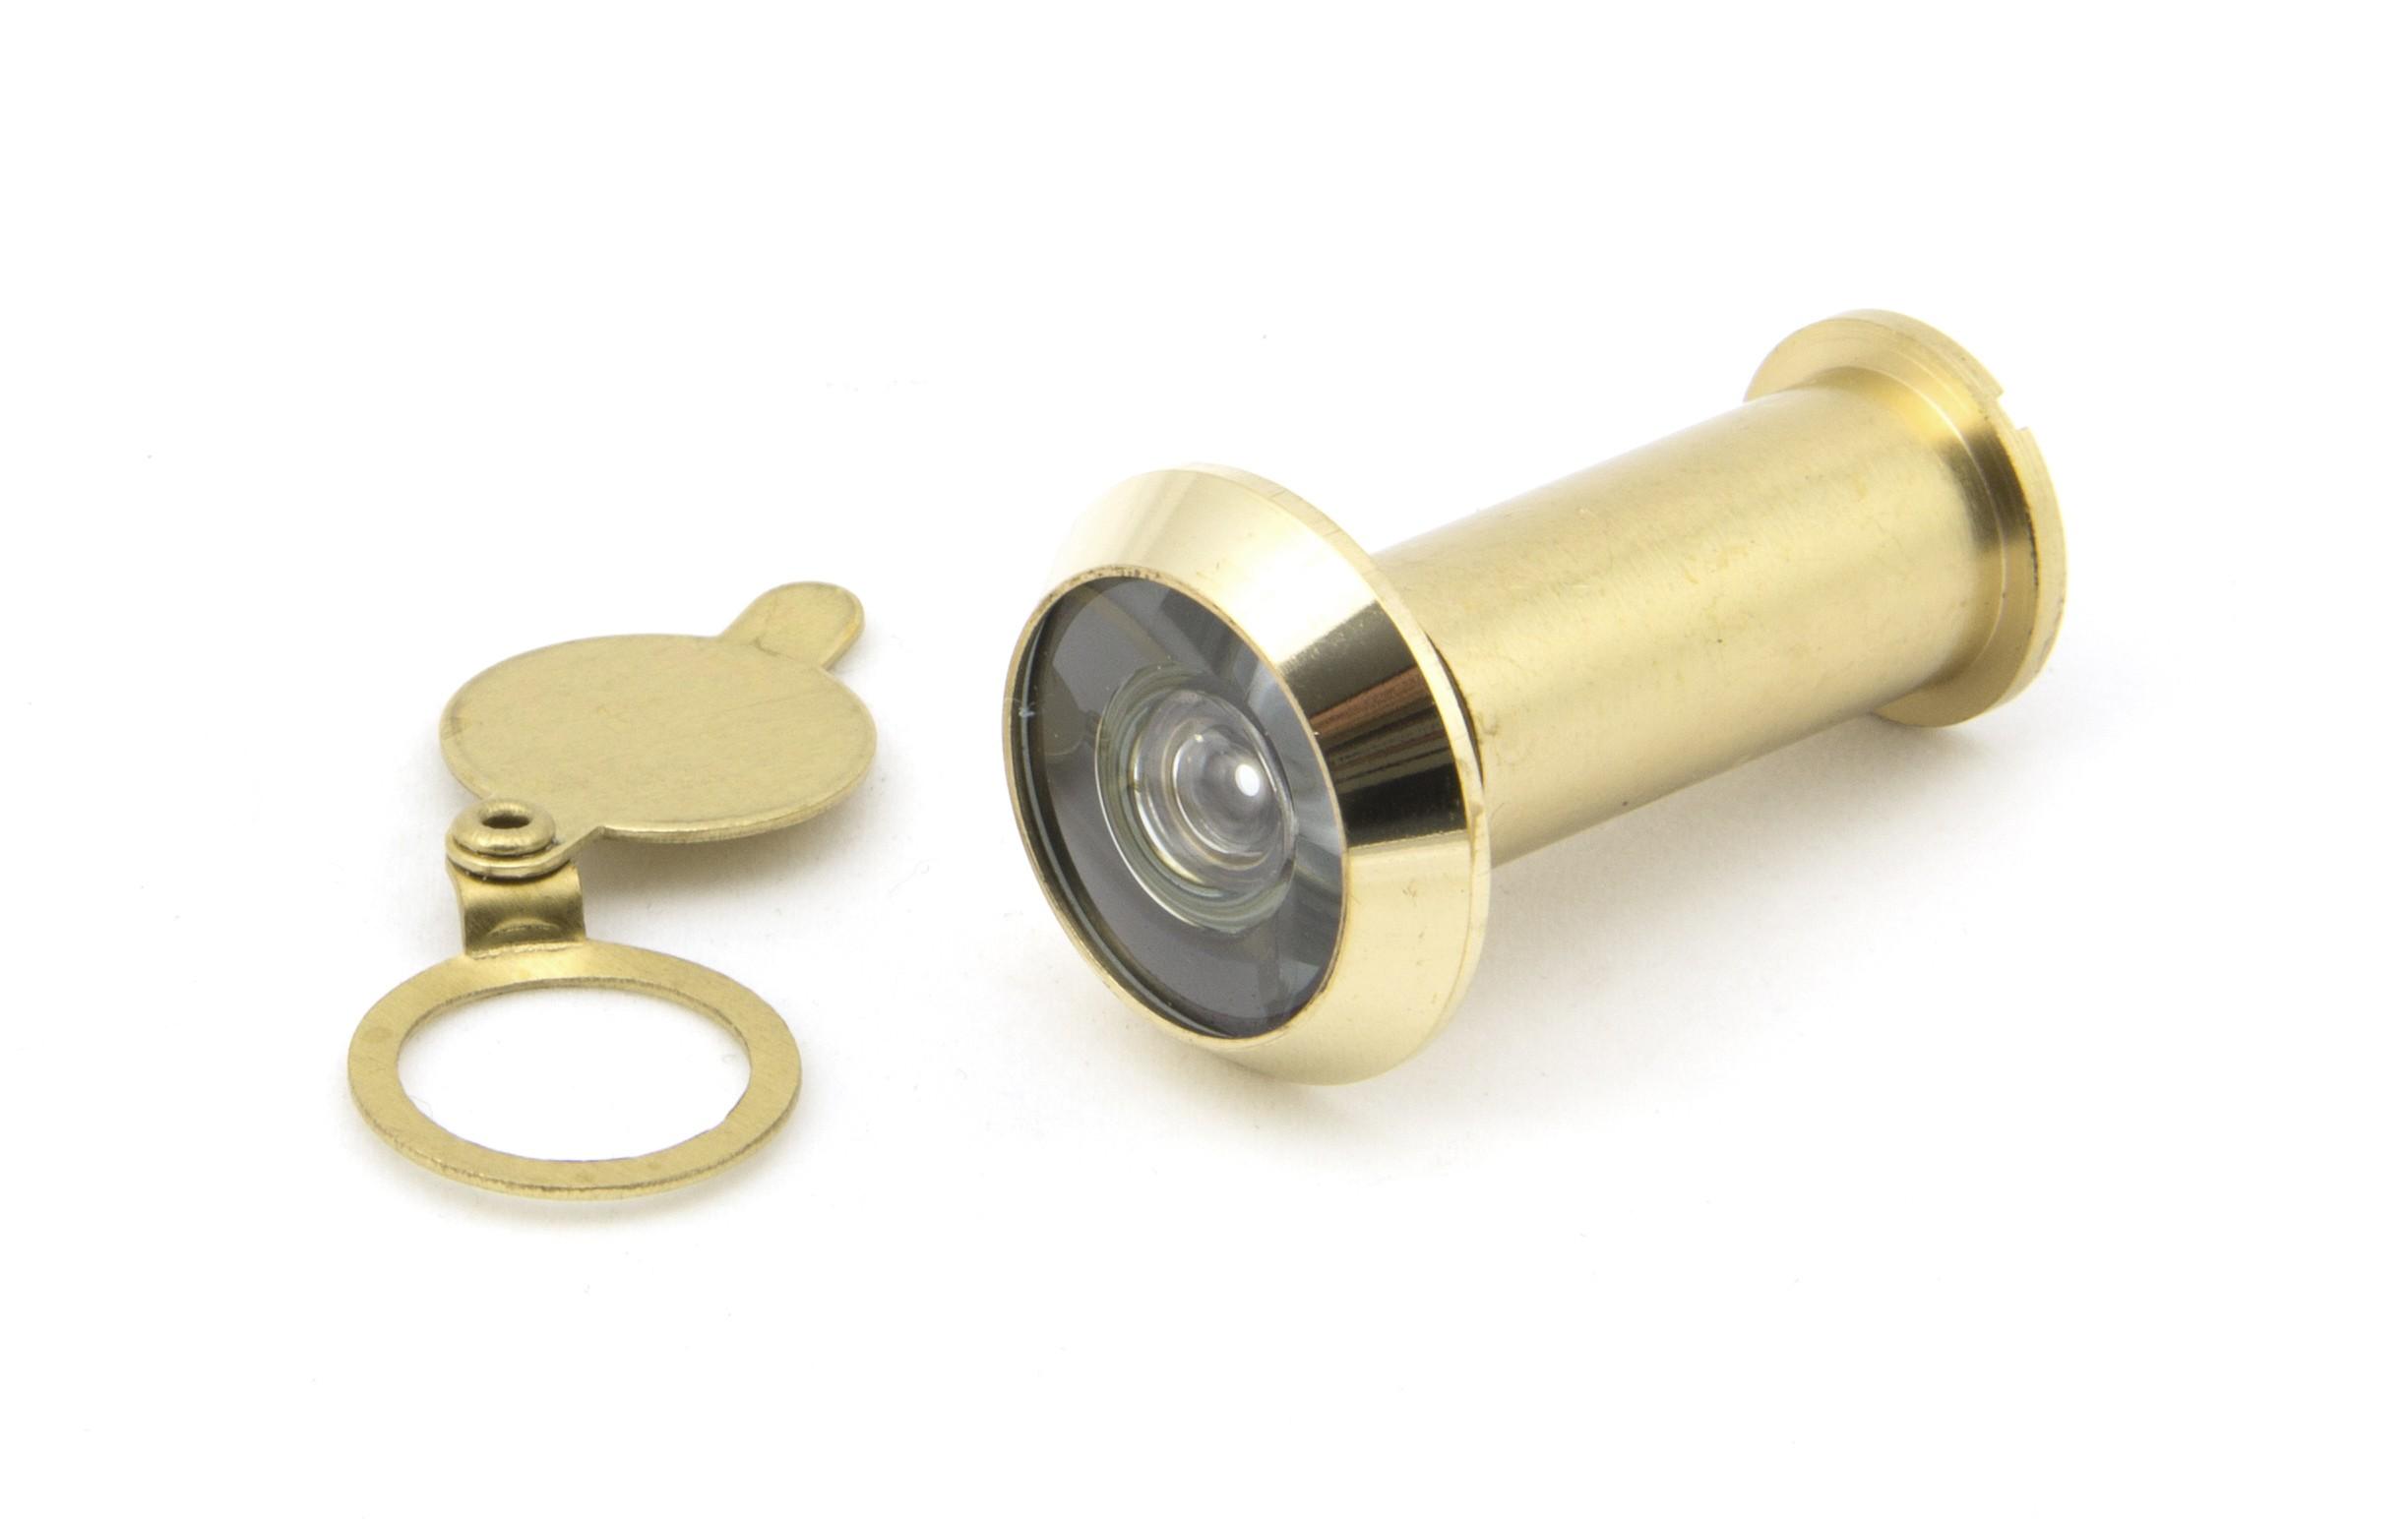 ANVIL - Brass Door viewer 180 degrees  Anvil91896